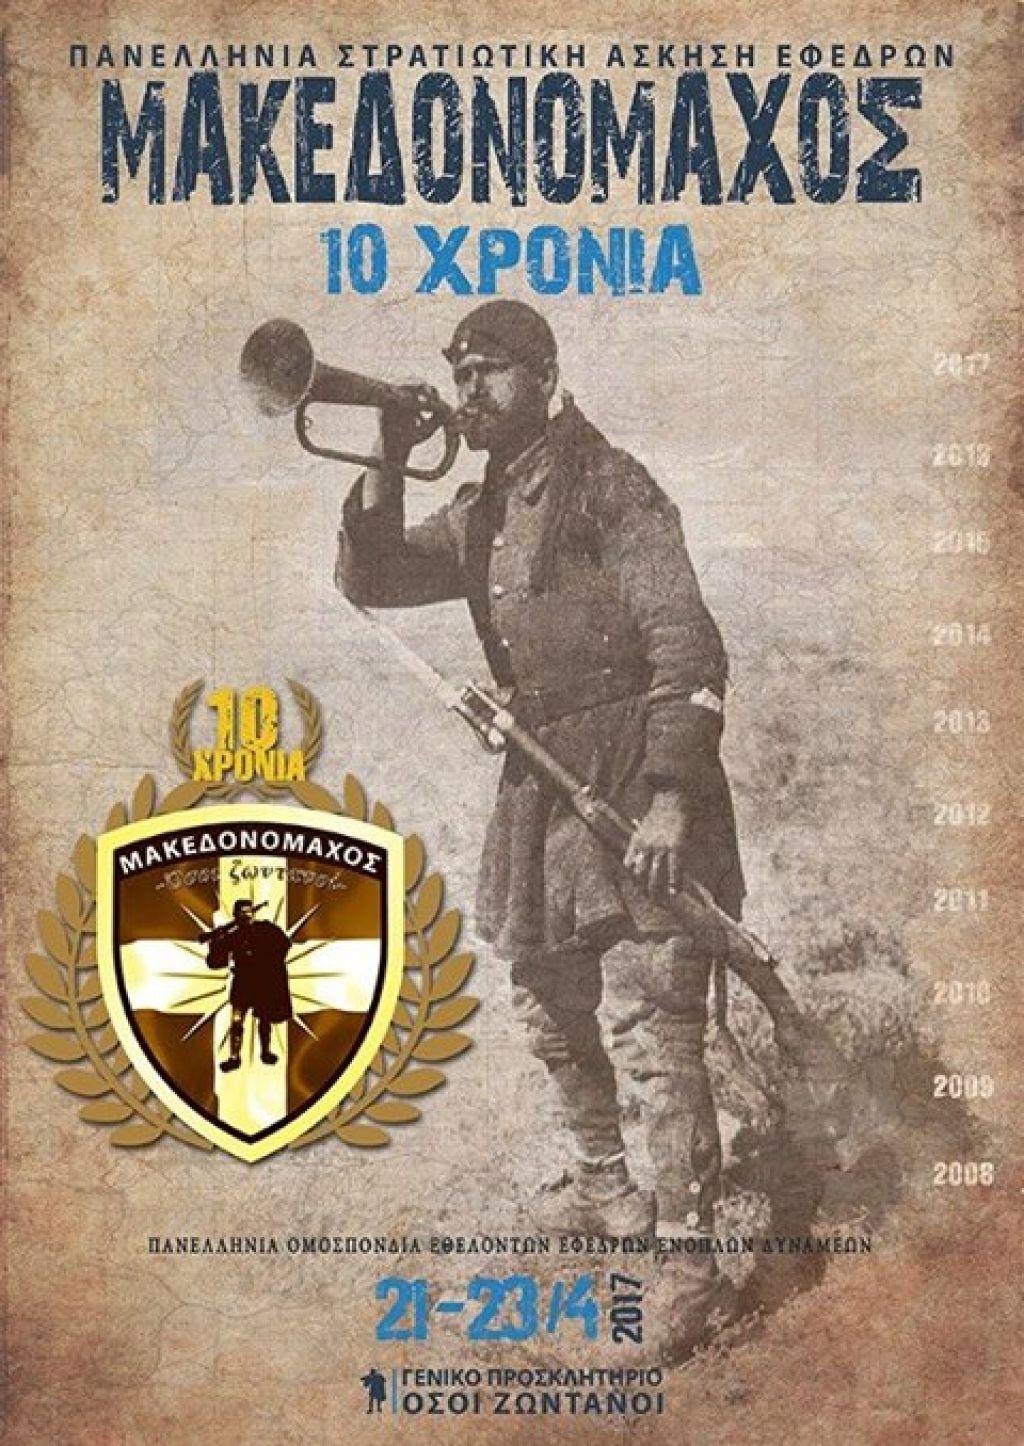 Mακεδονομάχος 2017 γενικές οδηγίες